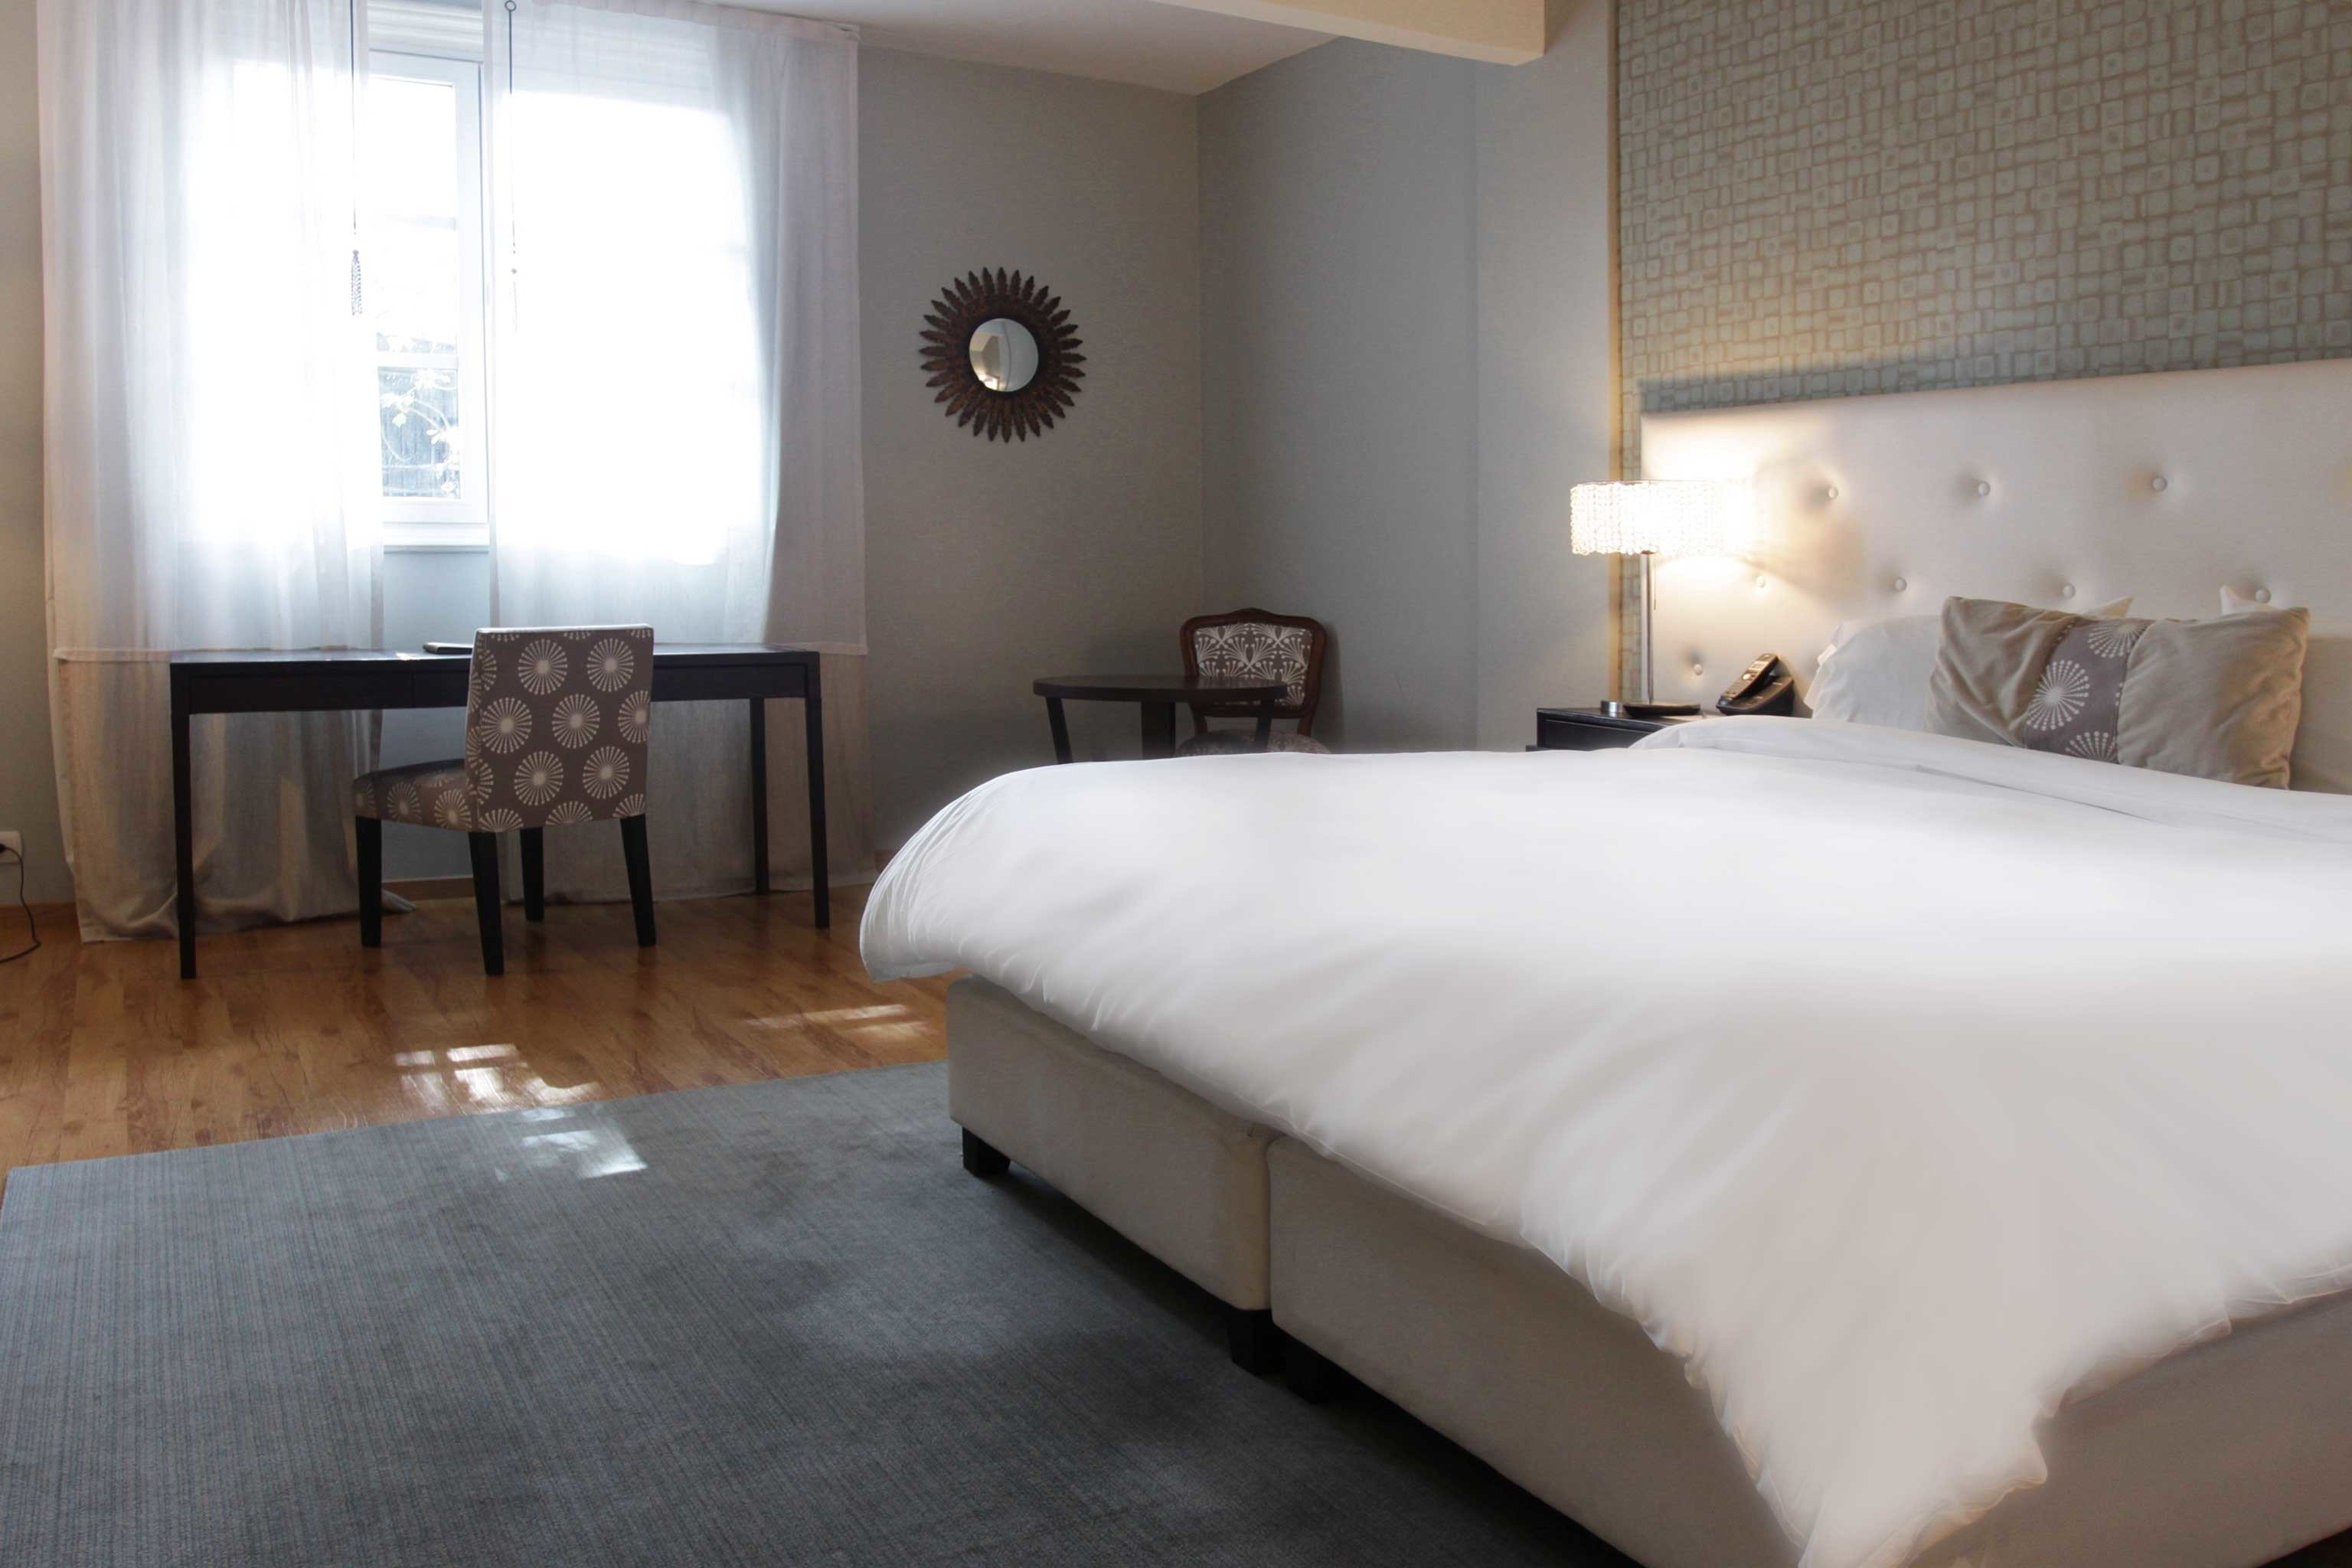 Bedroom City Classic property scene Suite white cottage bed frame Villa bed sheet